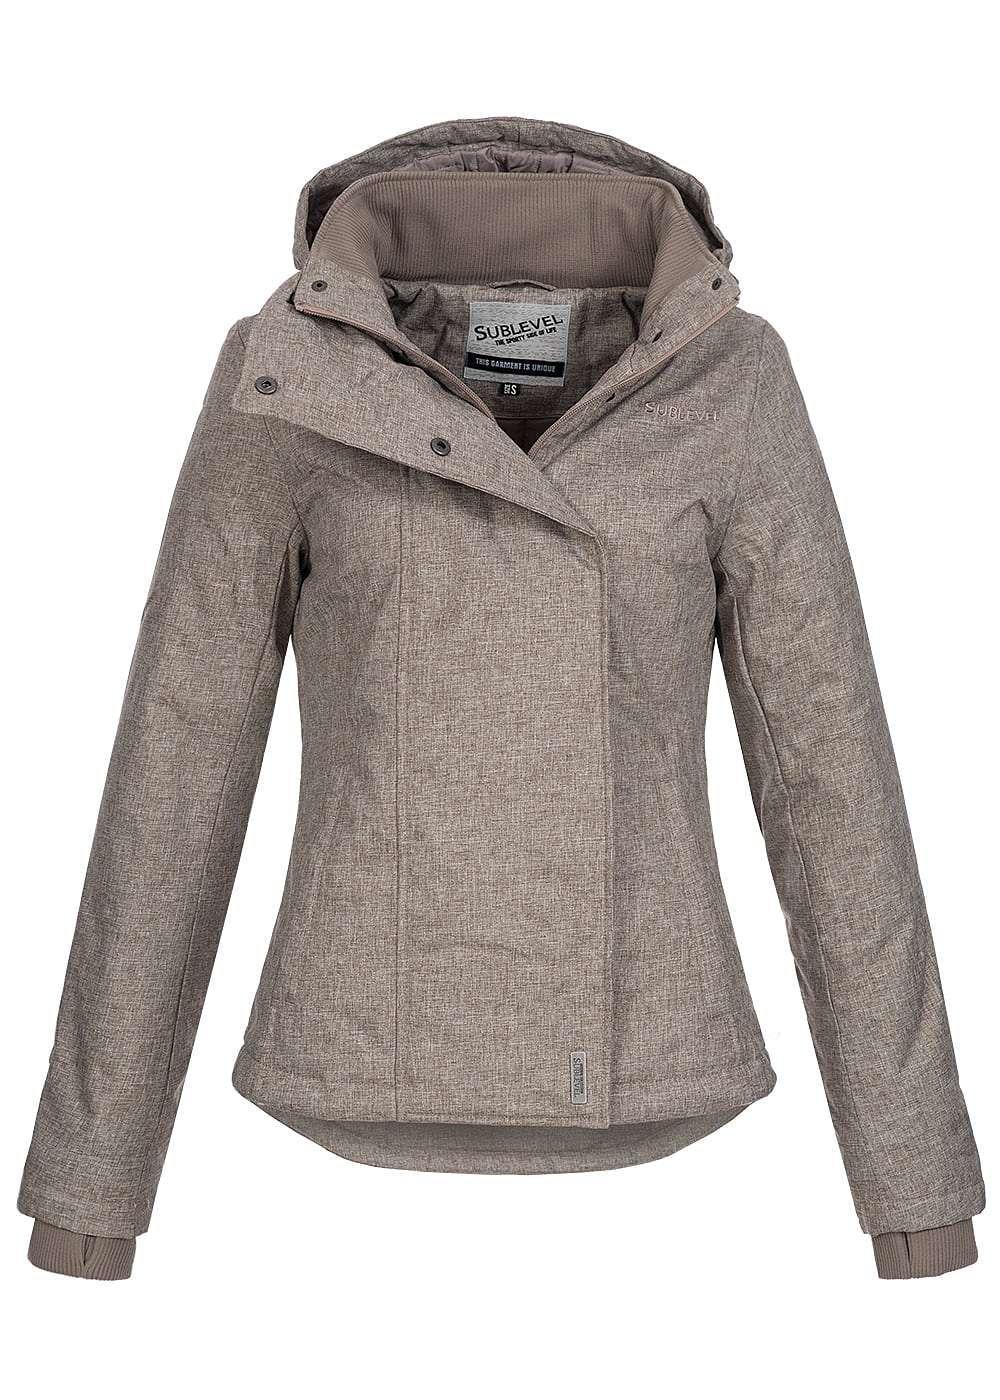 c170416f94699e Eight2Nine Damen Winter Jacke abnehmb Kapuze 2 Taschen by Sublevel braun  melange - 77onlineshop